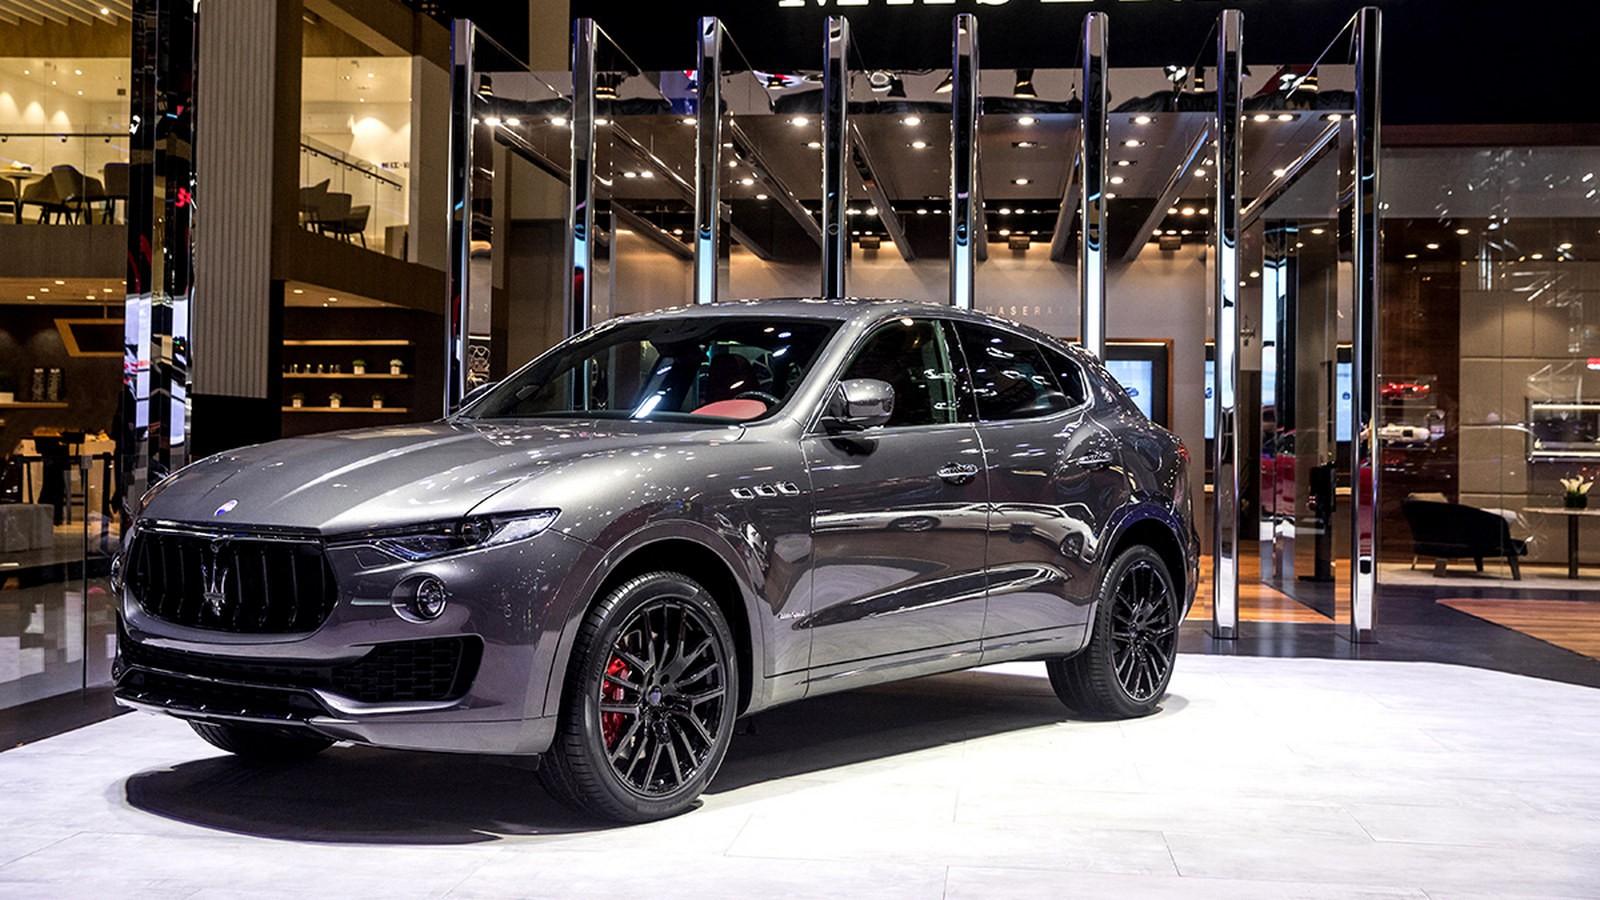 Maserati stand at Auto China 2018_Levante S GranSport MY18